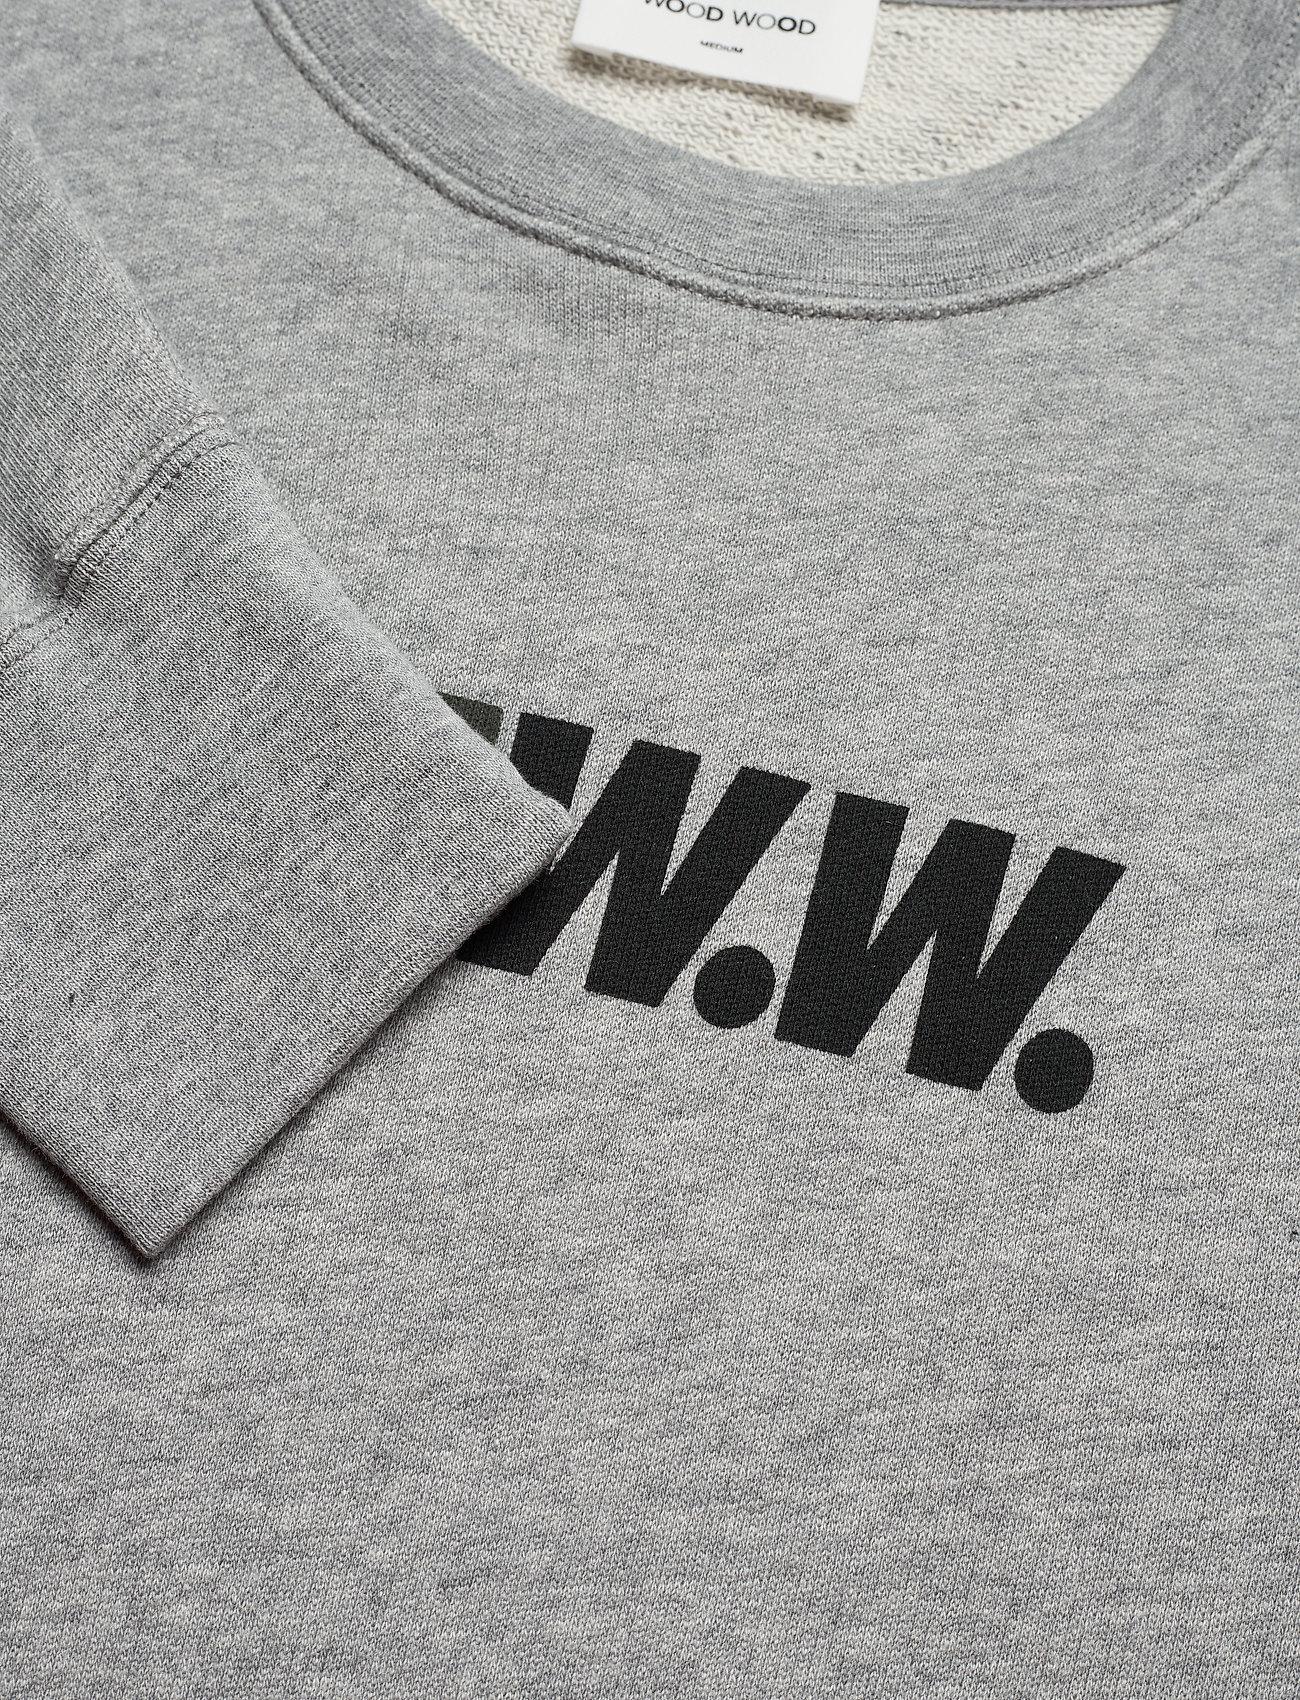 Hugh Sweatshirt (Grey Melange) (77 €) - Wood Wood 415xQ